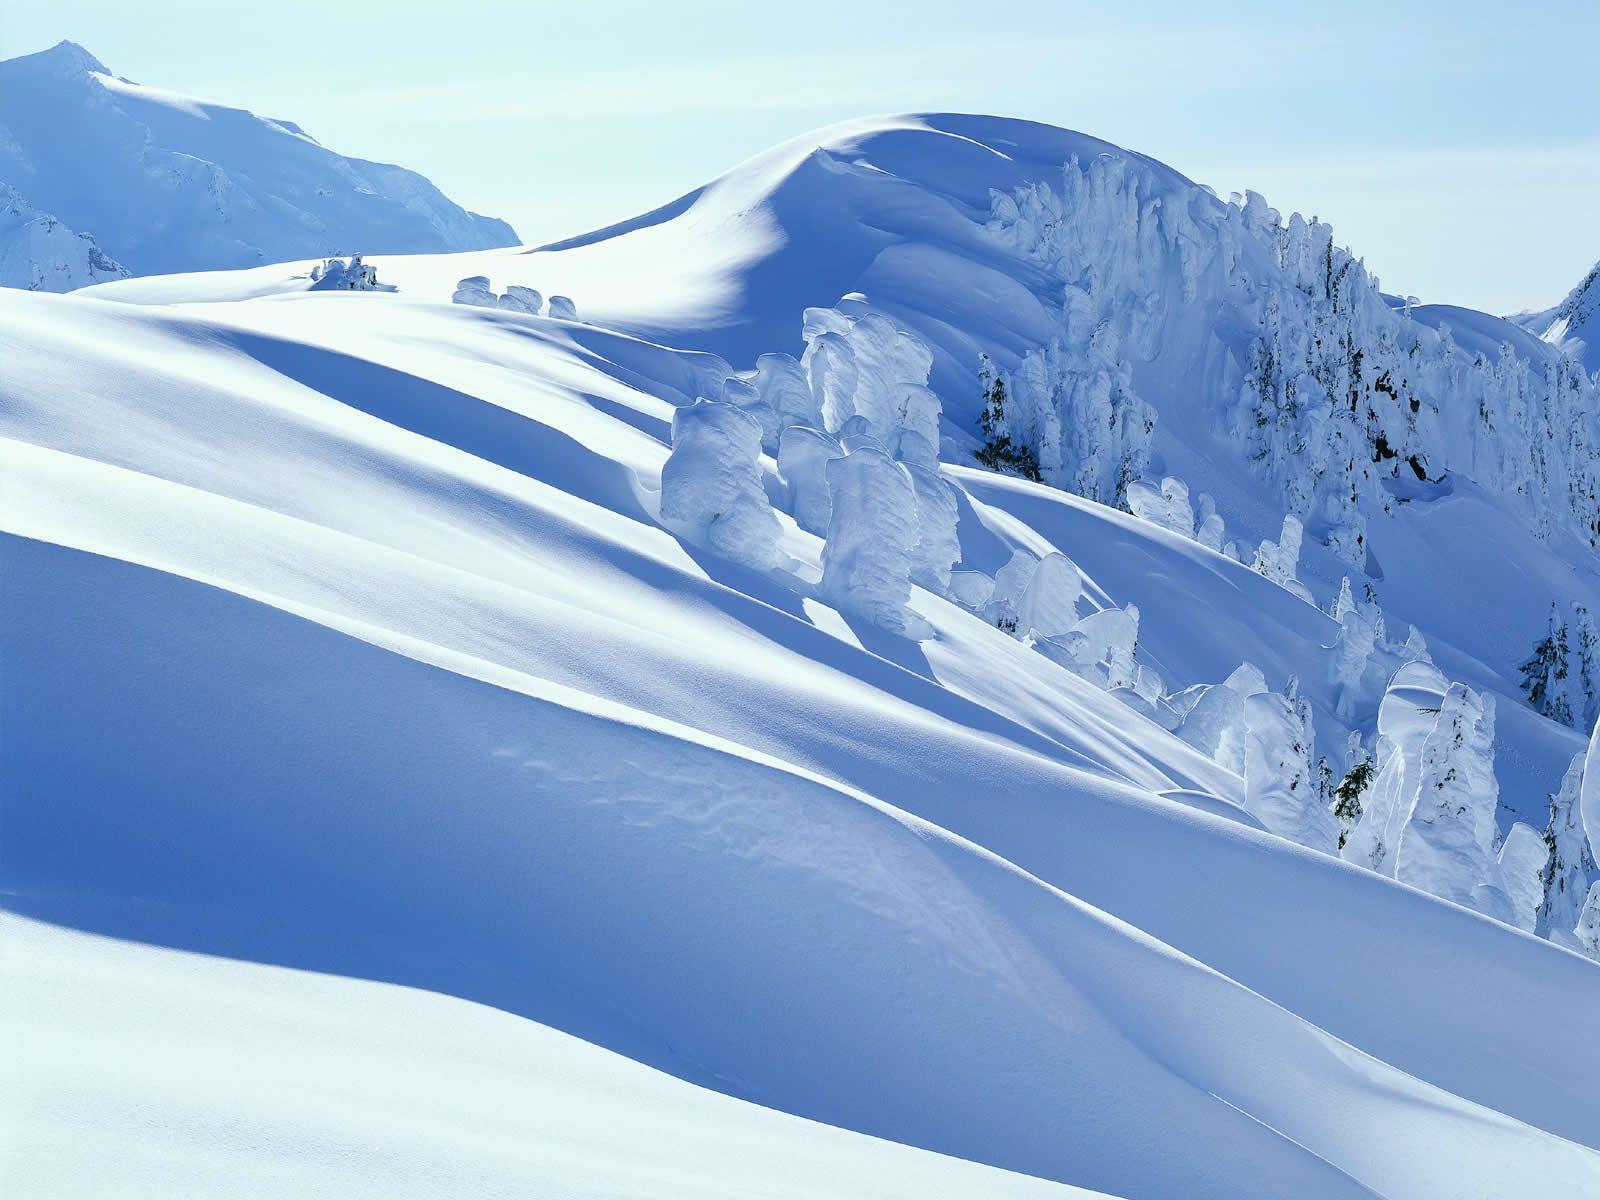 Beautiful Wallpaper Mountain Windows 7 - 359e1083c125a796a4018910252c3204  Pictures_137255.jpg